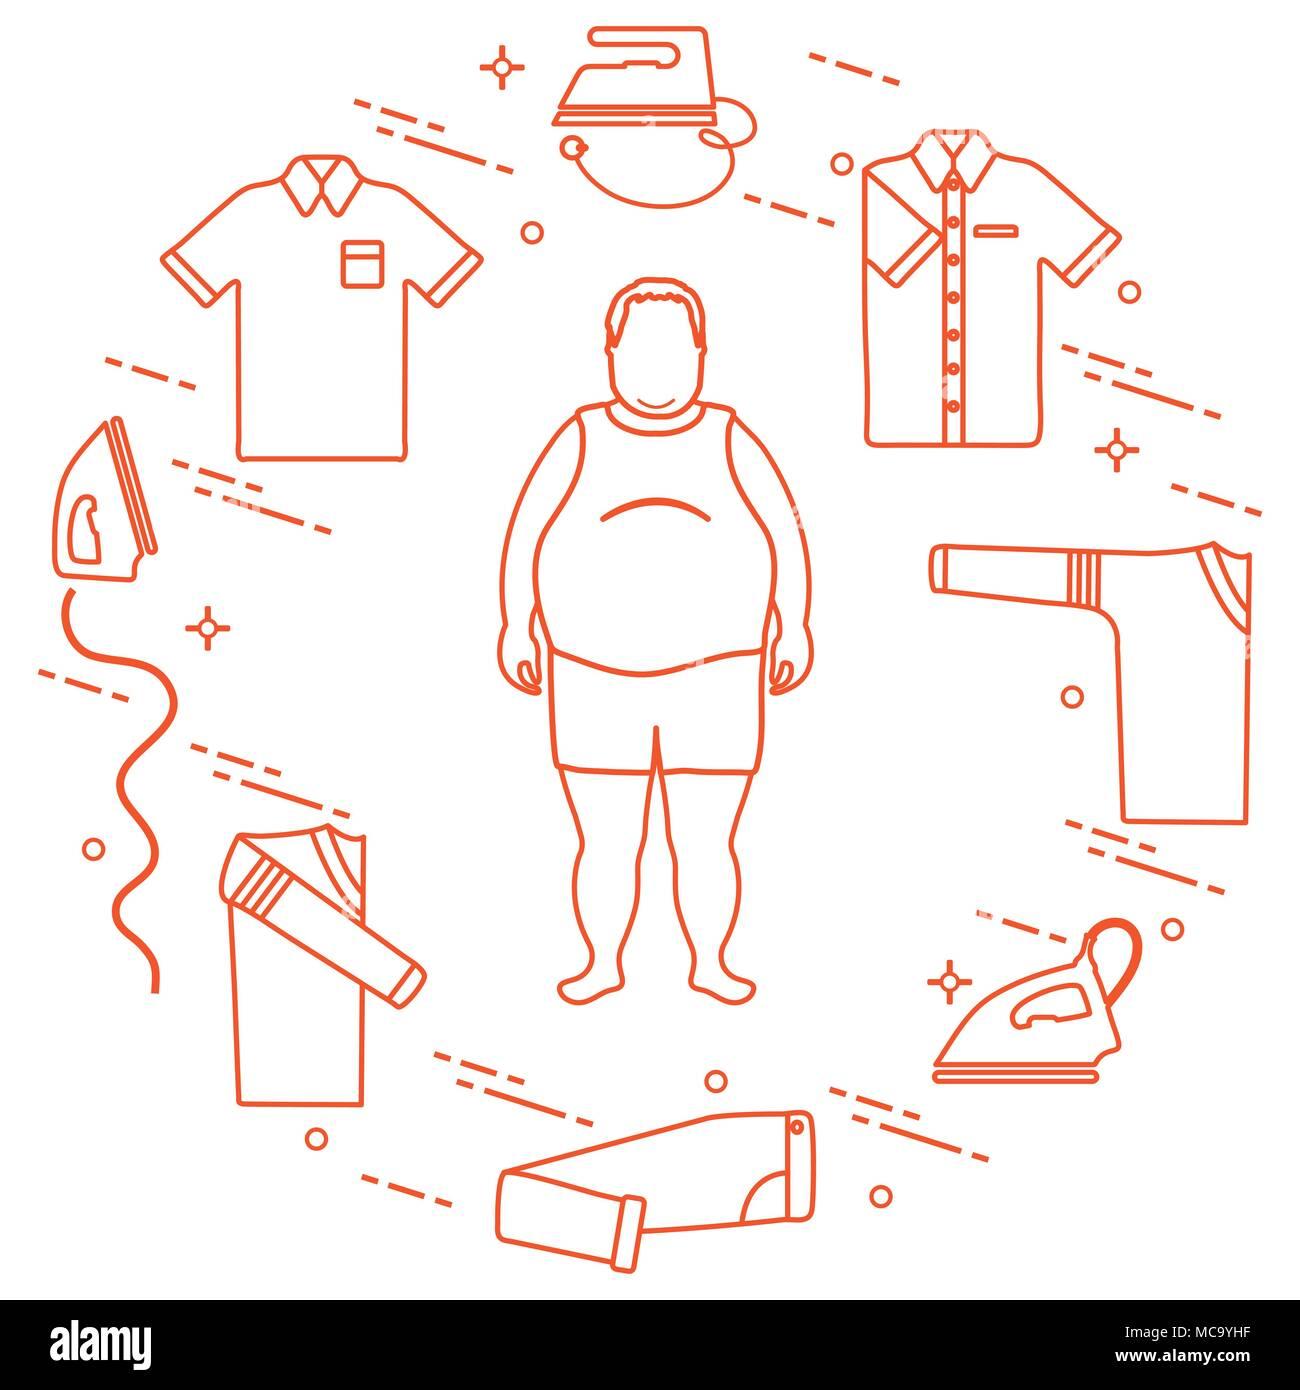 fat man irons folded trousers t shirt jumper shirt design for